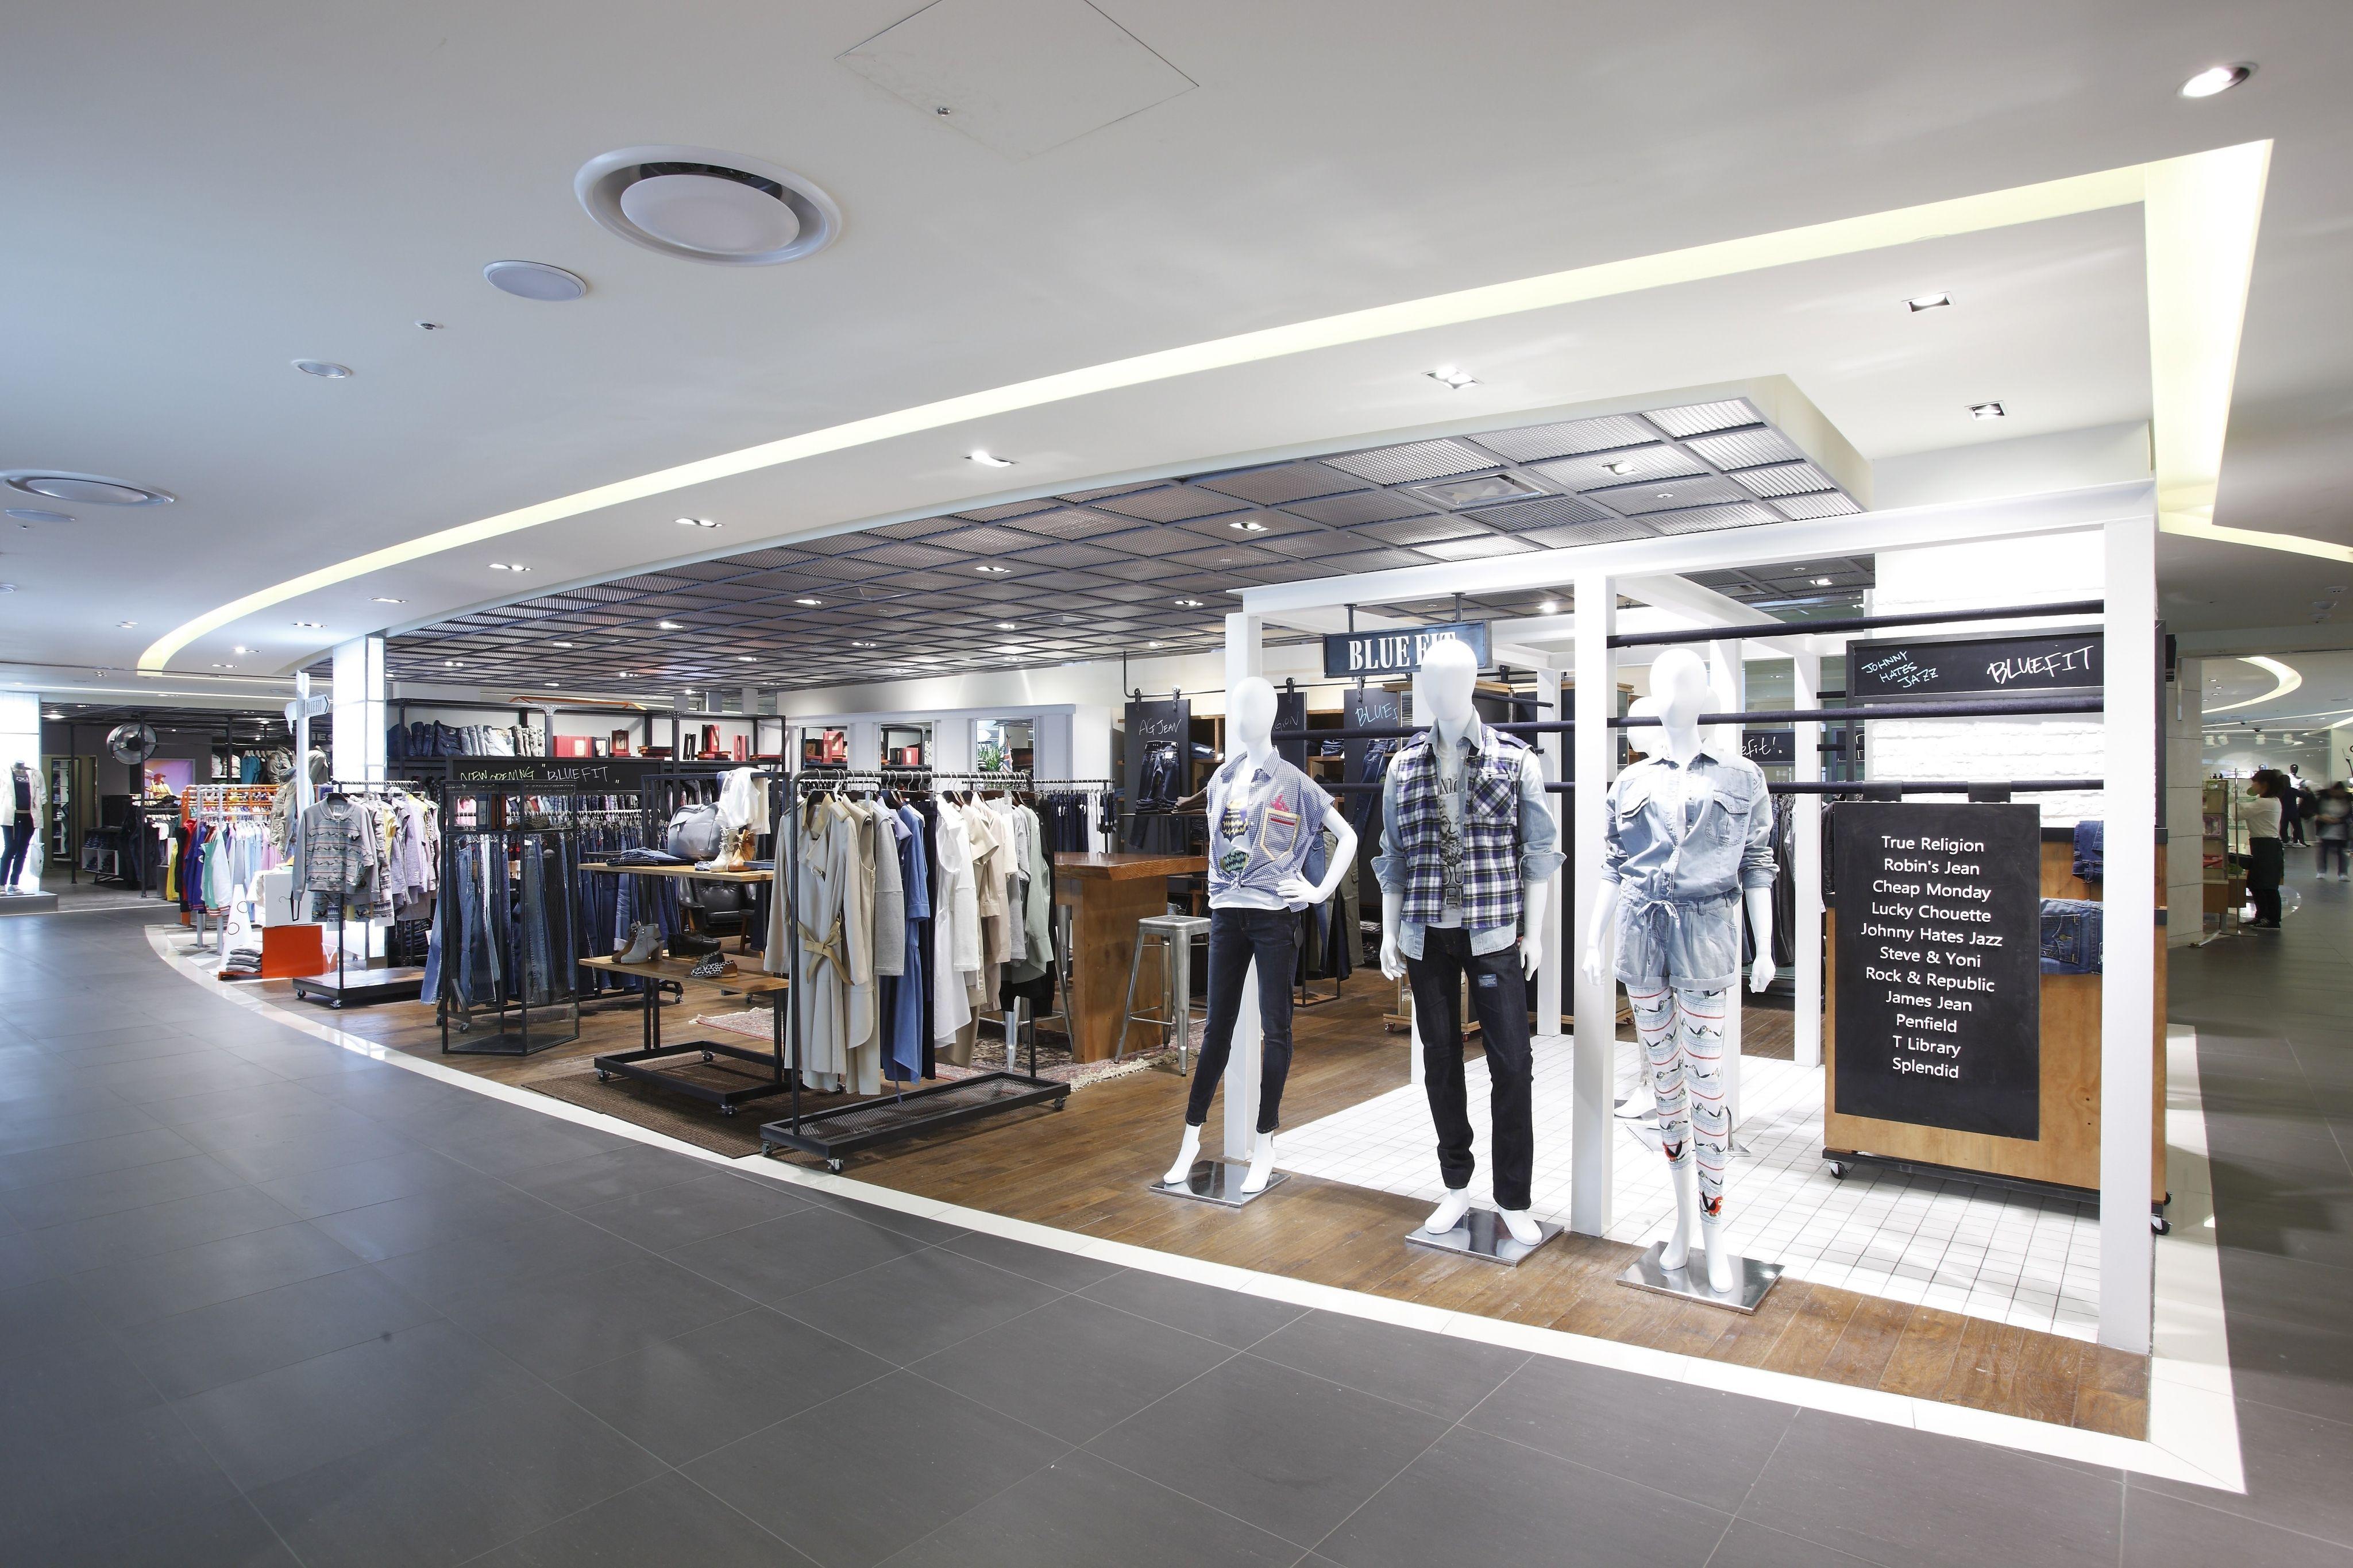 Stylish Retail Store Interior Design Ideas interior paint colors